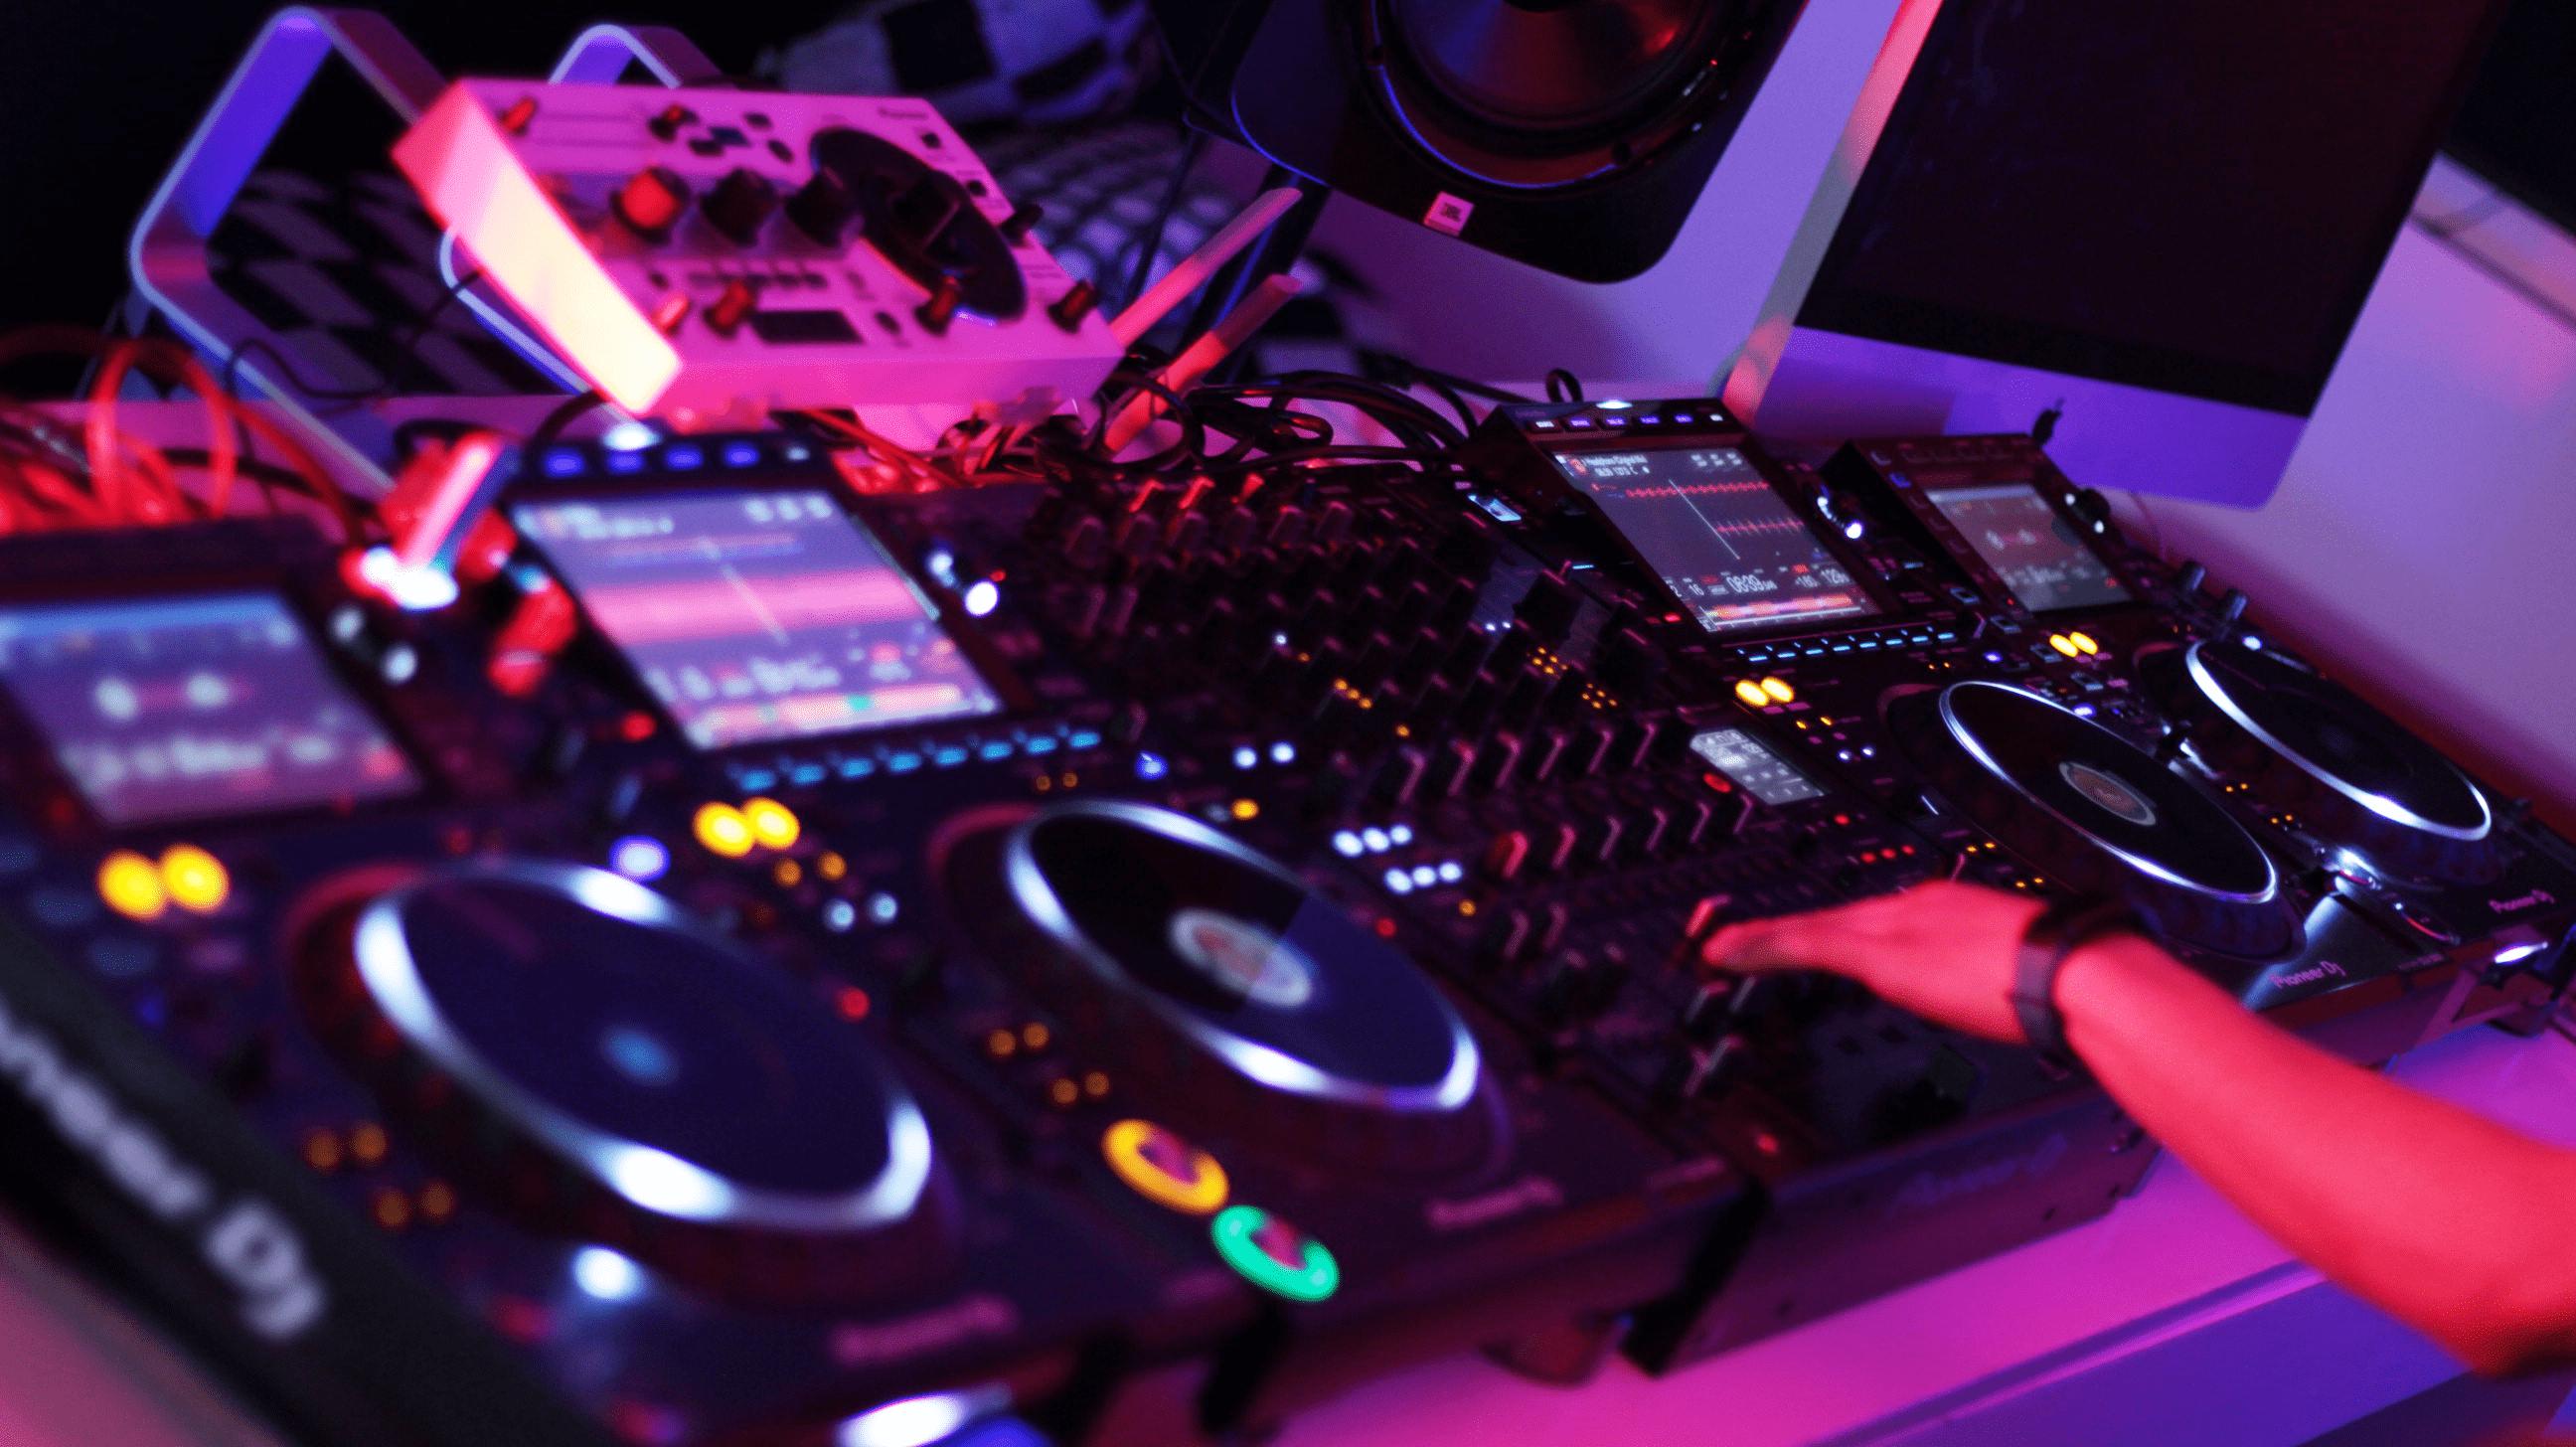 curso dj, academia dj, escuela dj, clases dj, produccion musical, ableton live